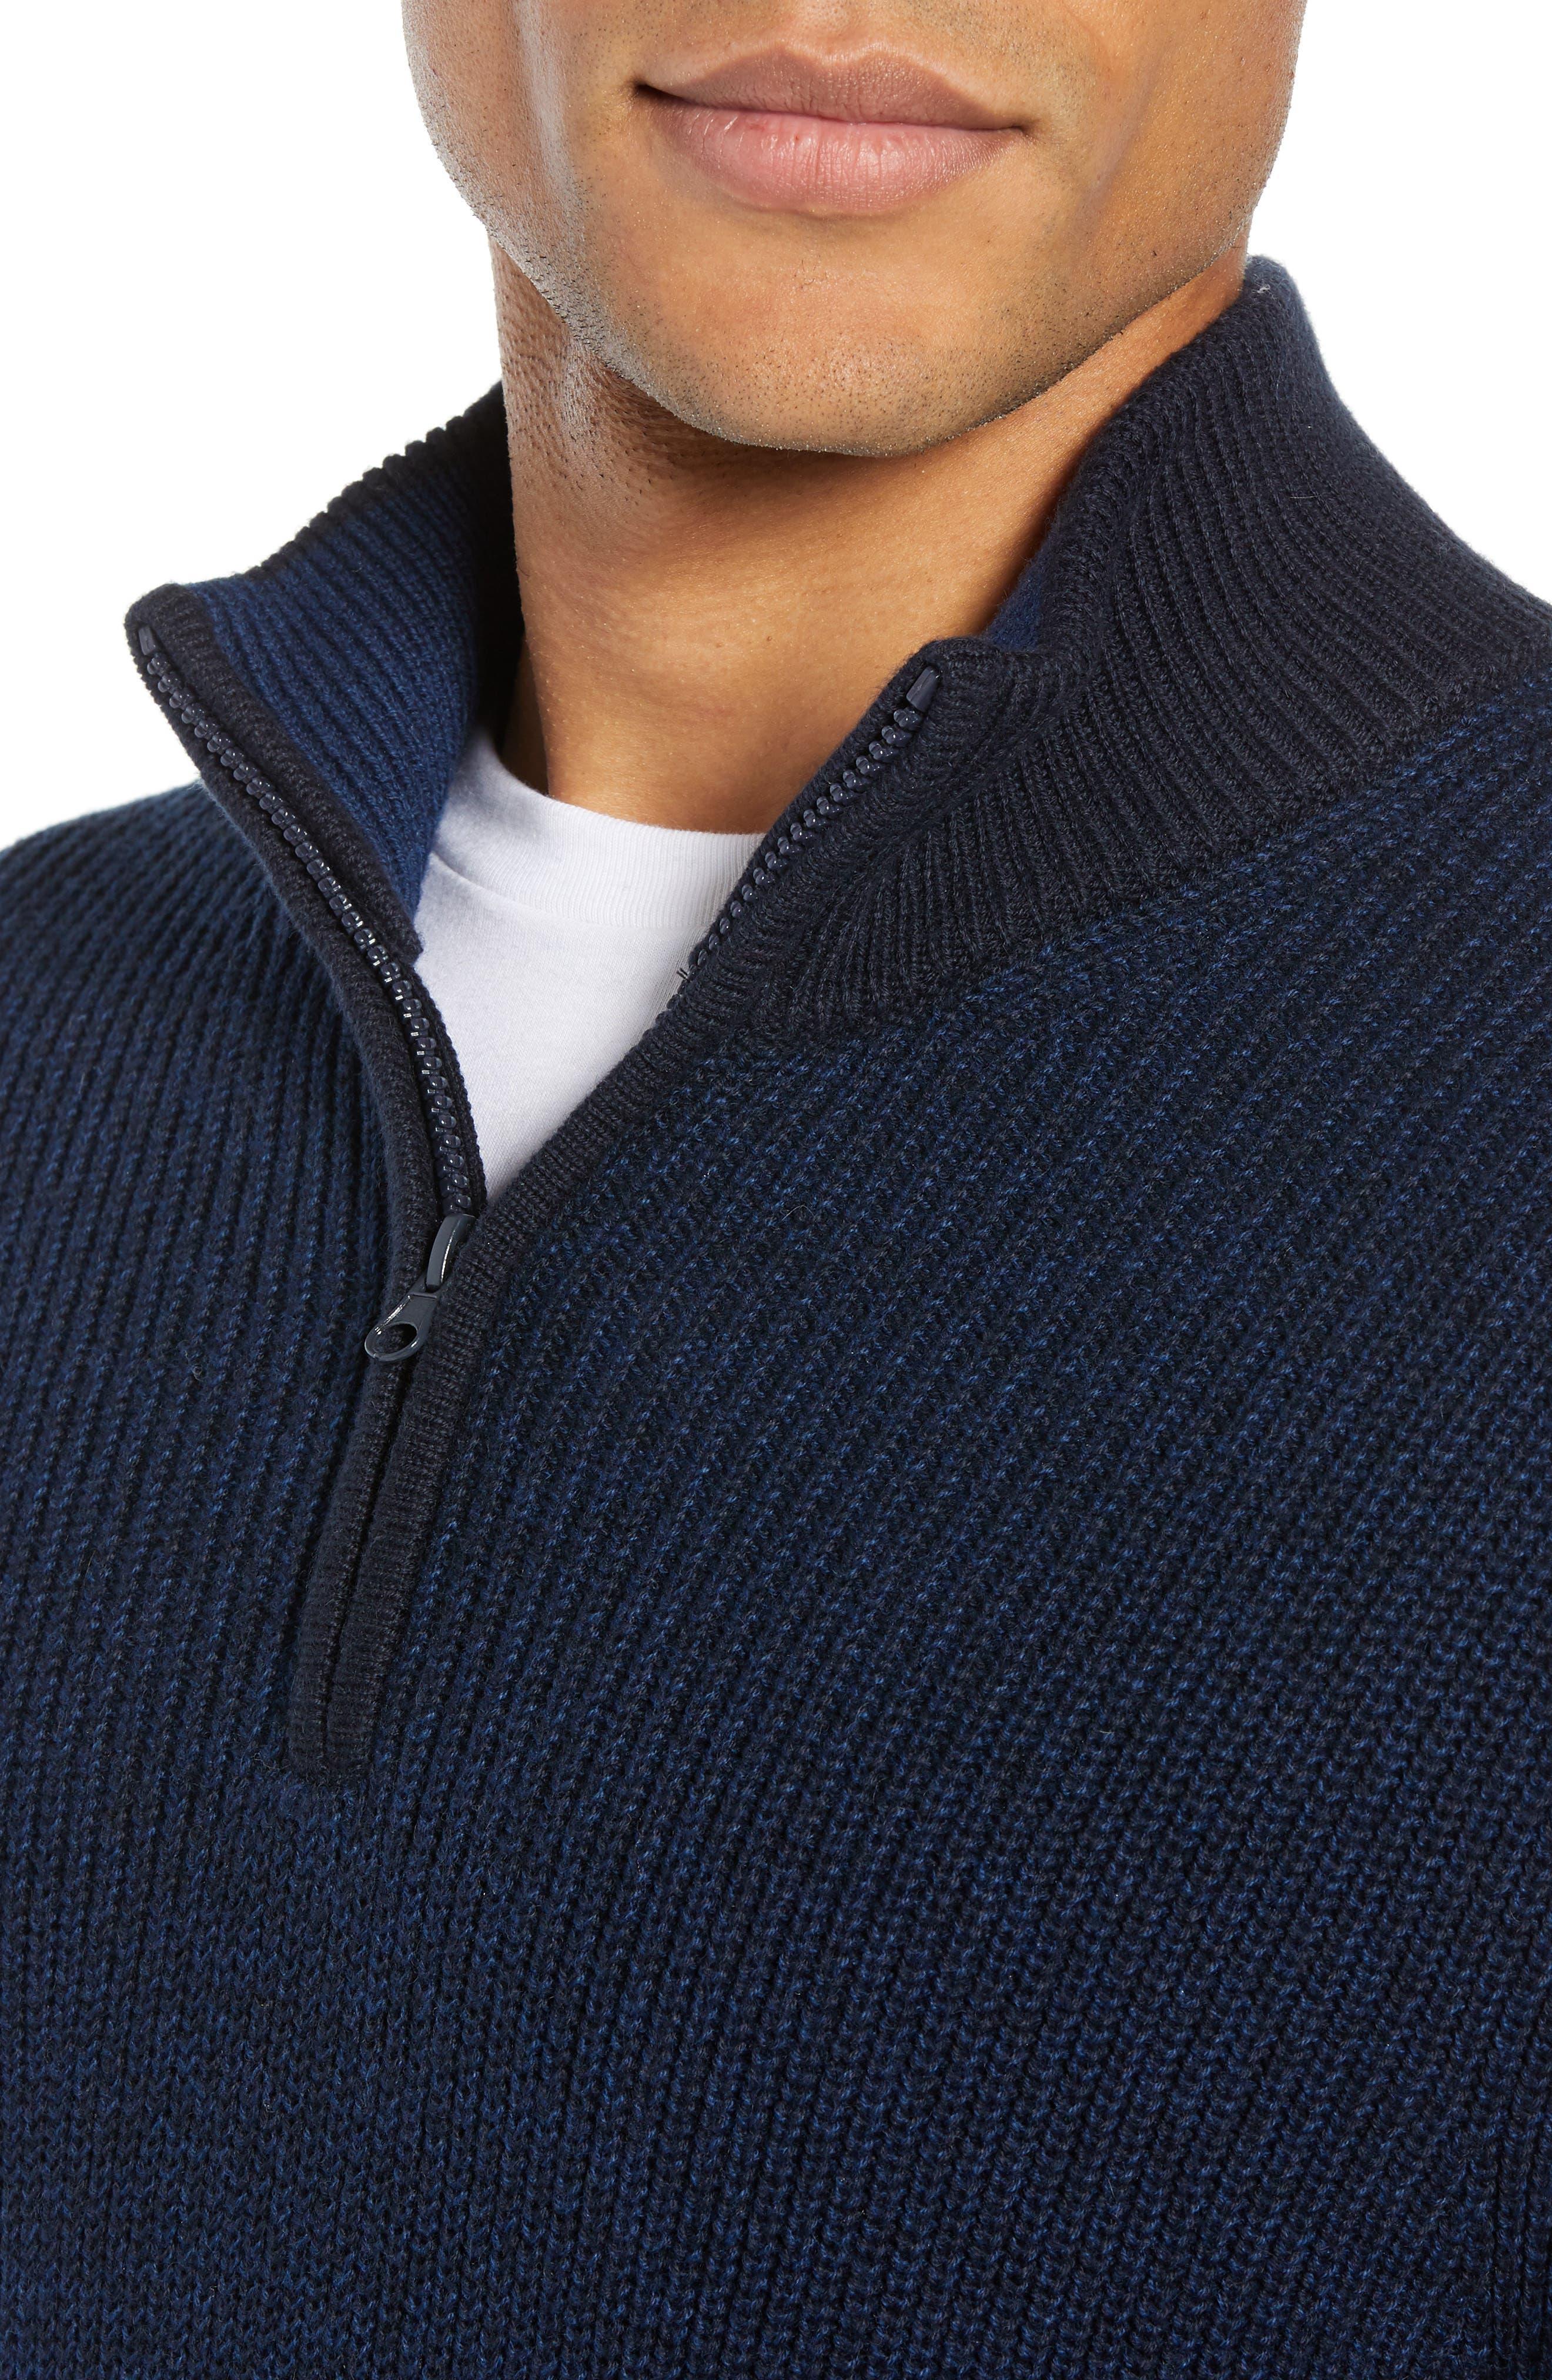 Fillmore Quarter Zip Sweater,                             Alternate thumbnail 4, color,                             NAVY